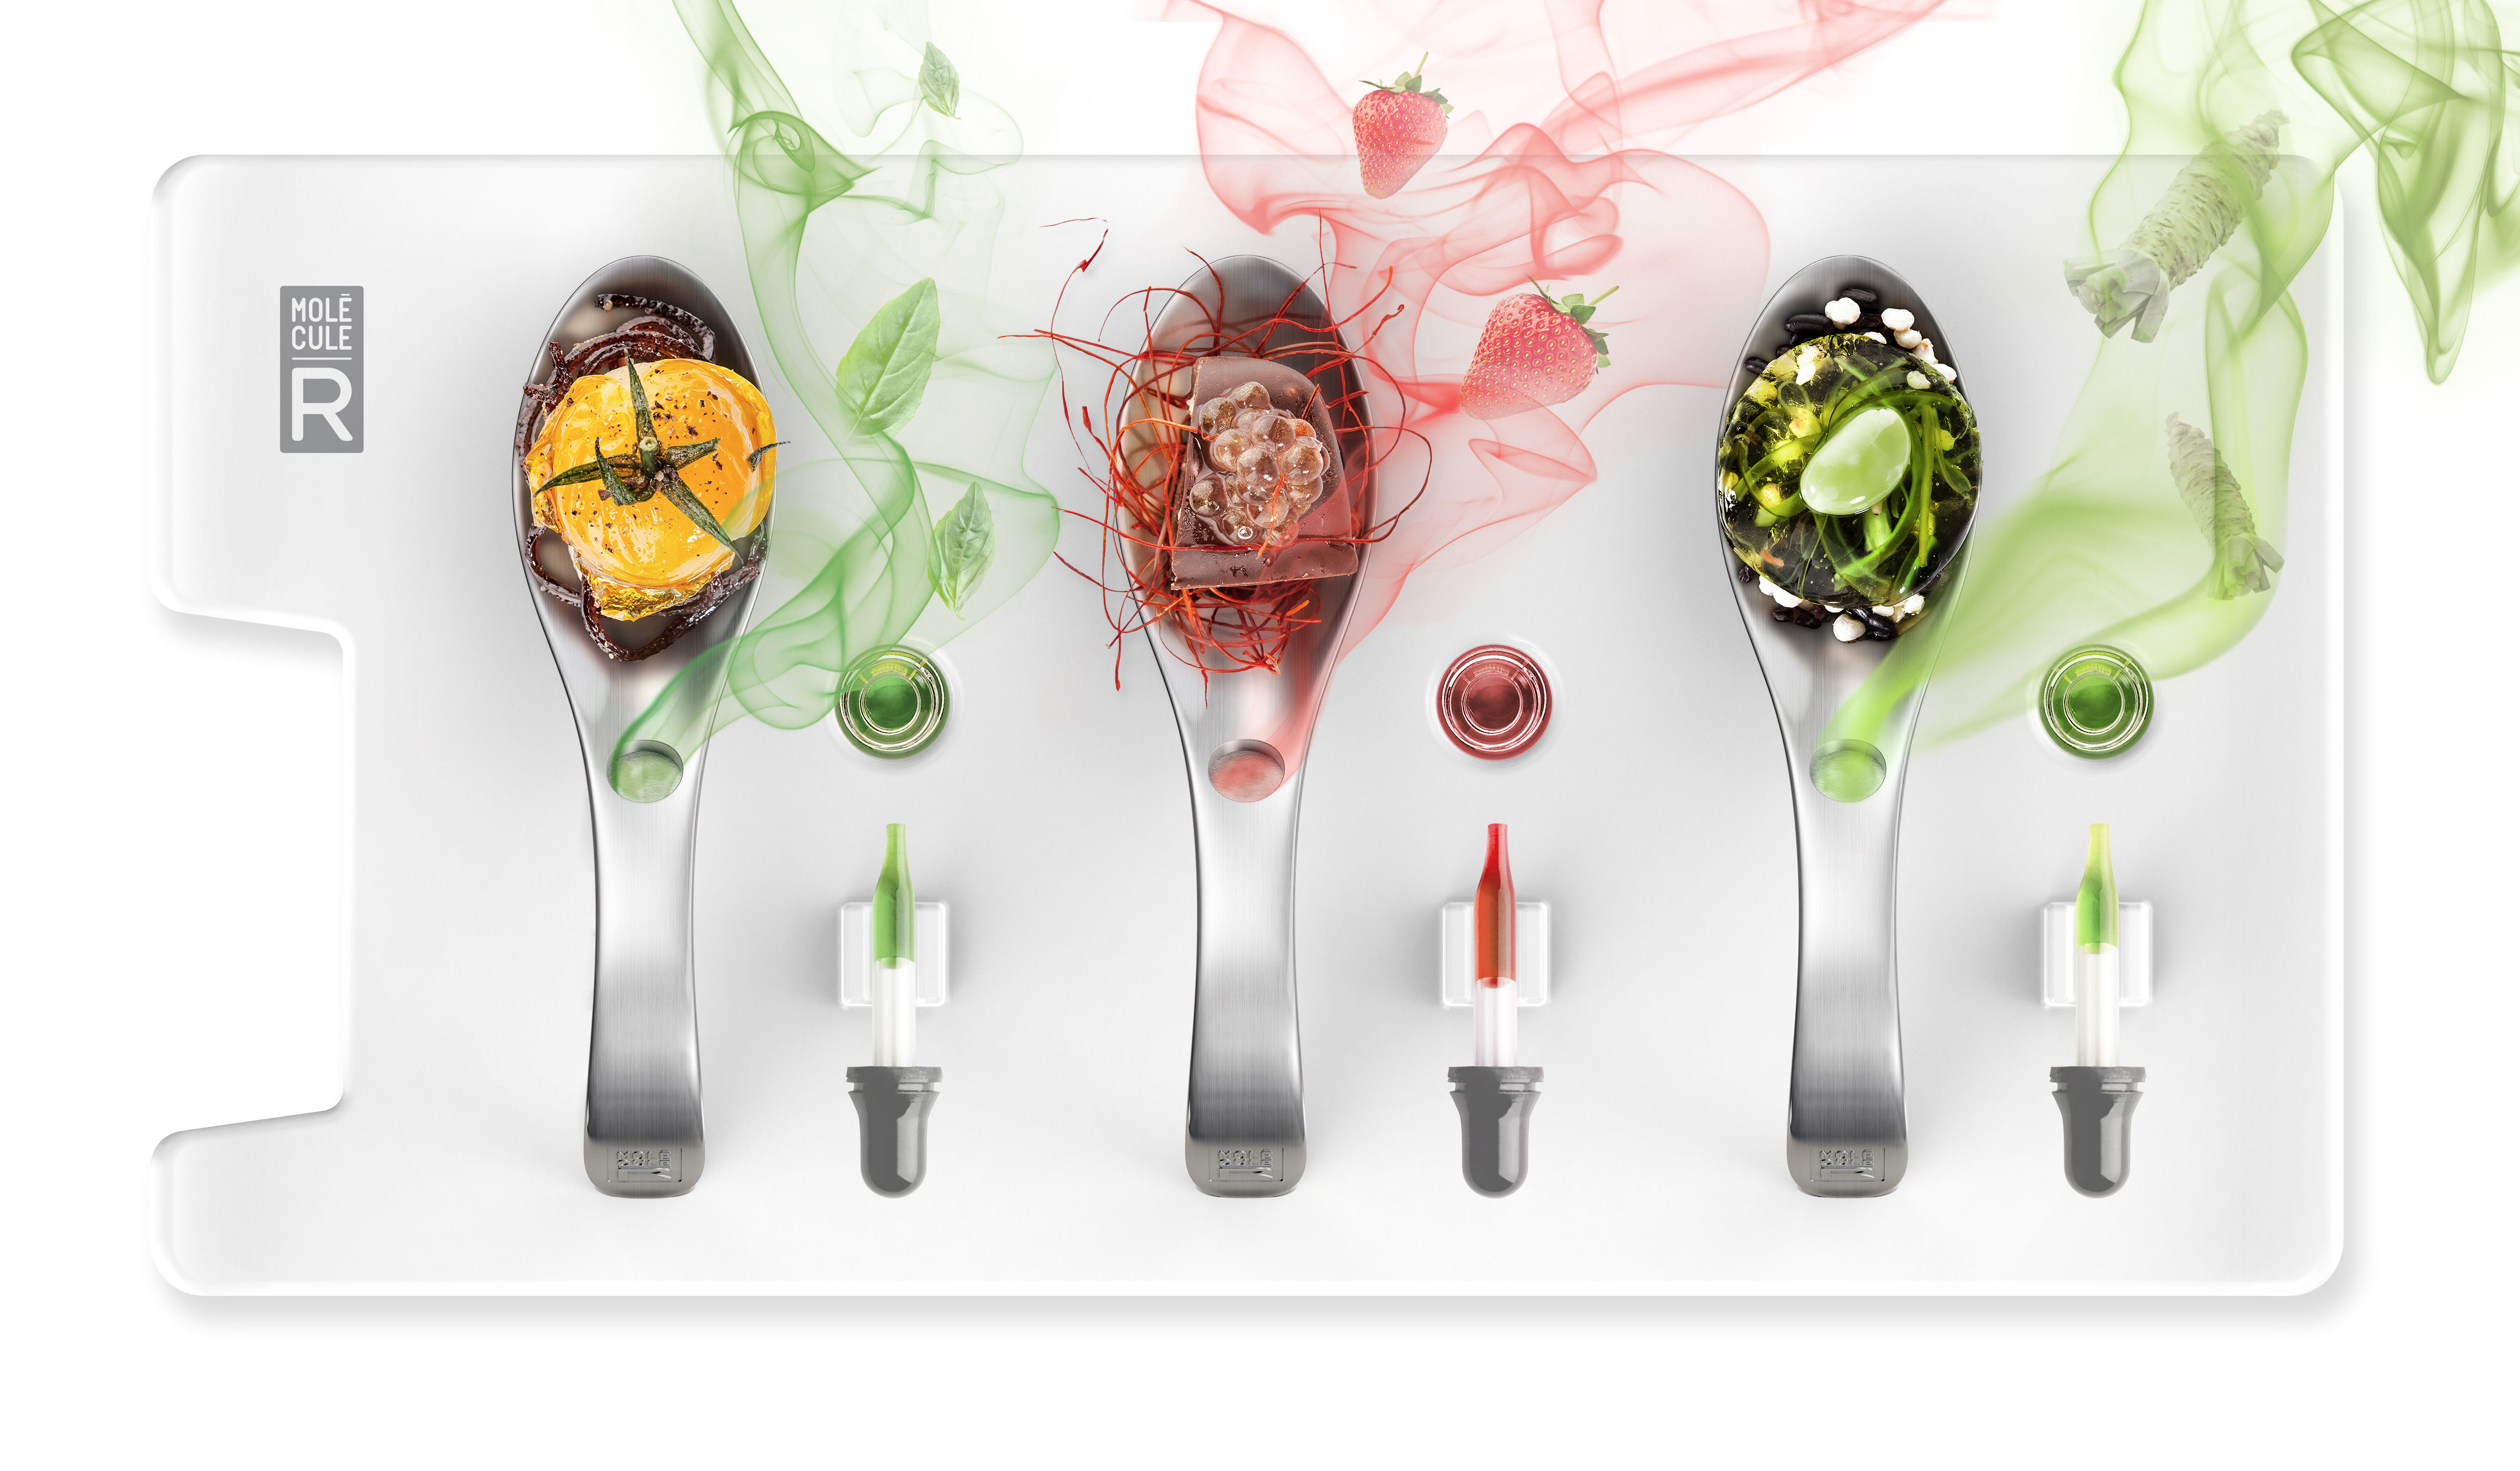 Kit cuisine mol culaire service aromatique aromaspoons for Kit cuisine moleculaire cultura